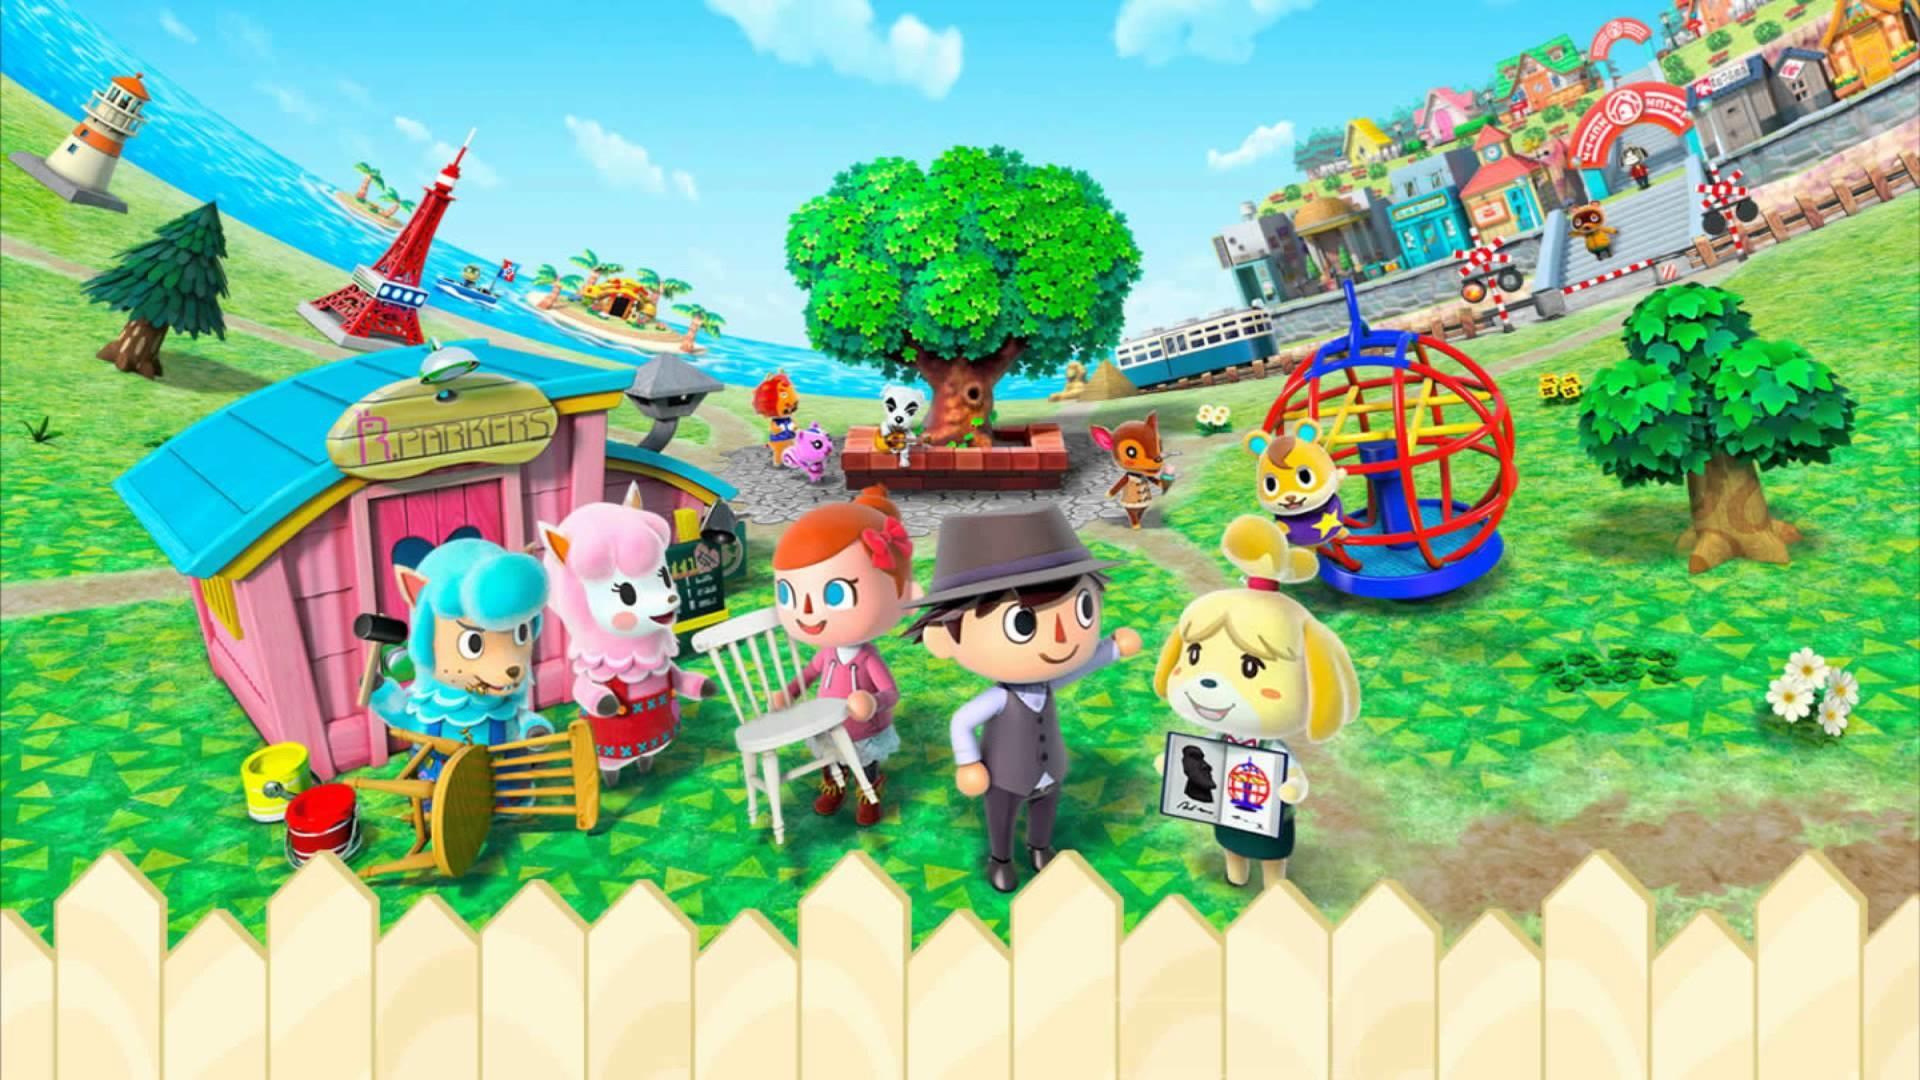 Res: 1920x1080, Computerspiele - Animal Crossing: New Leaf Wallpaper